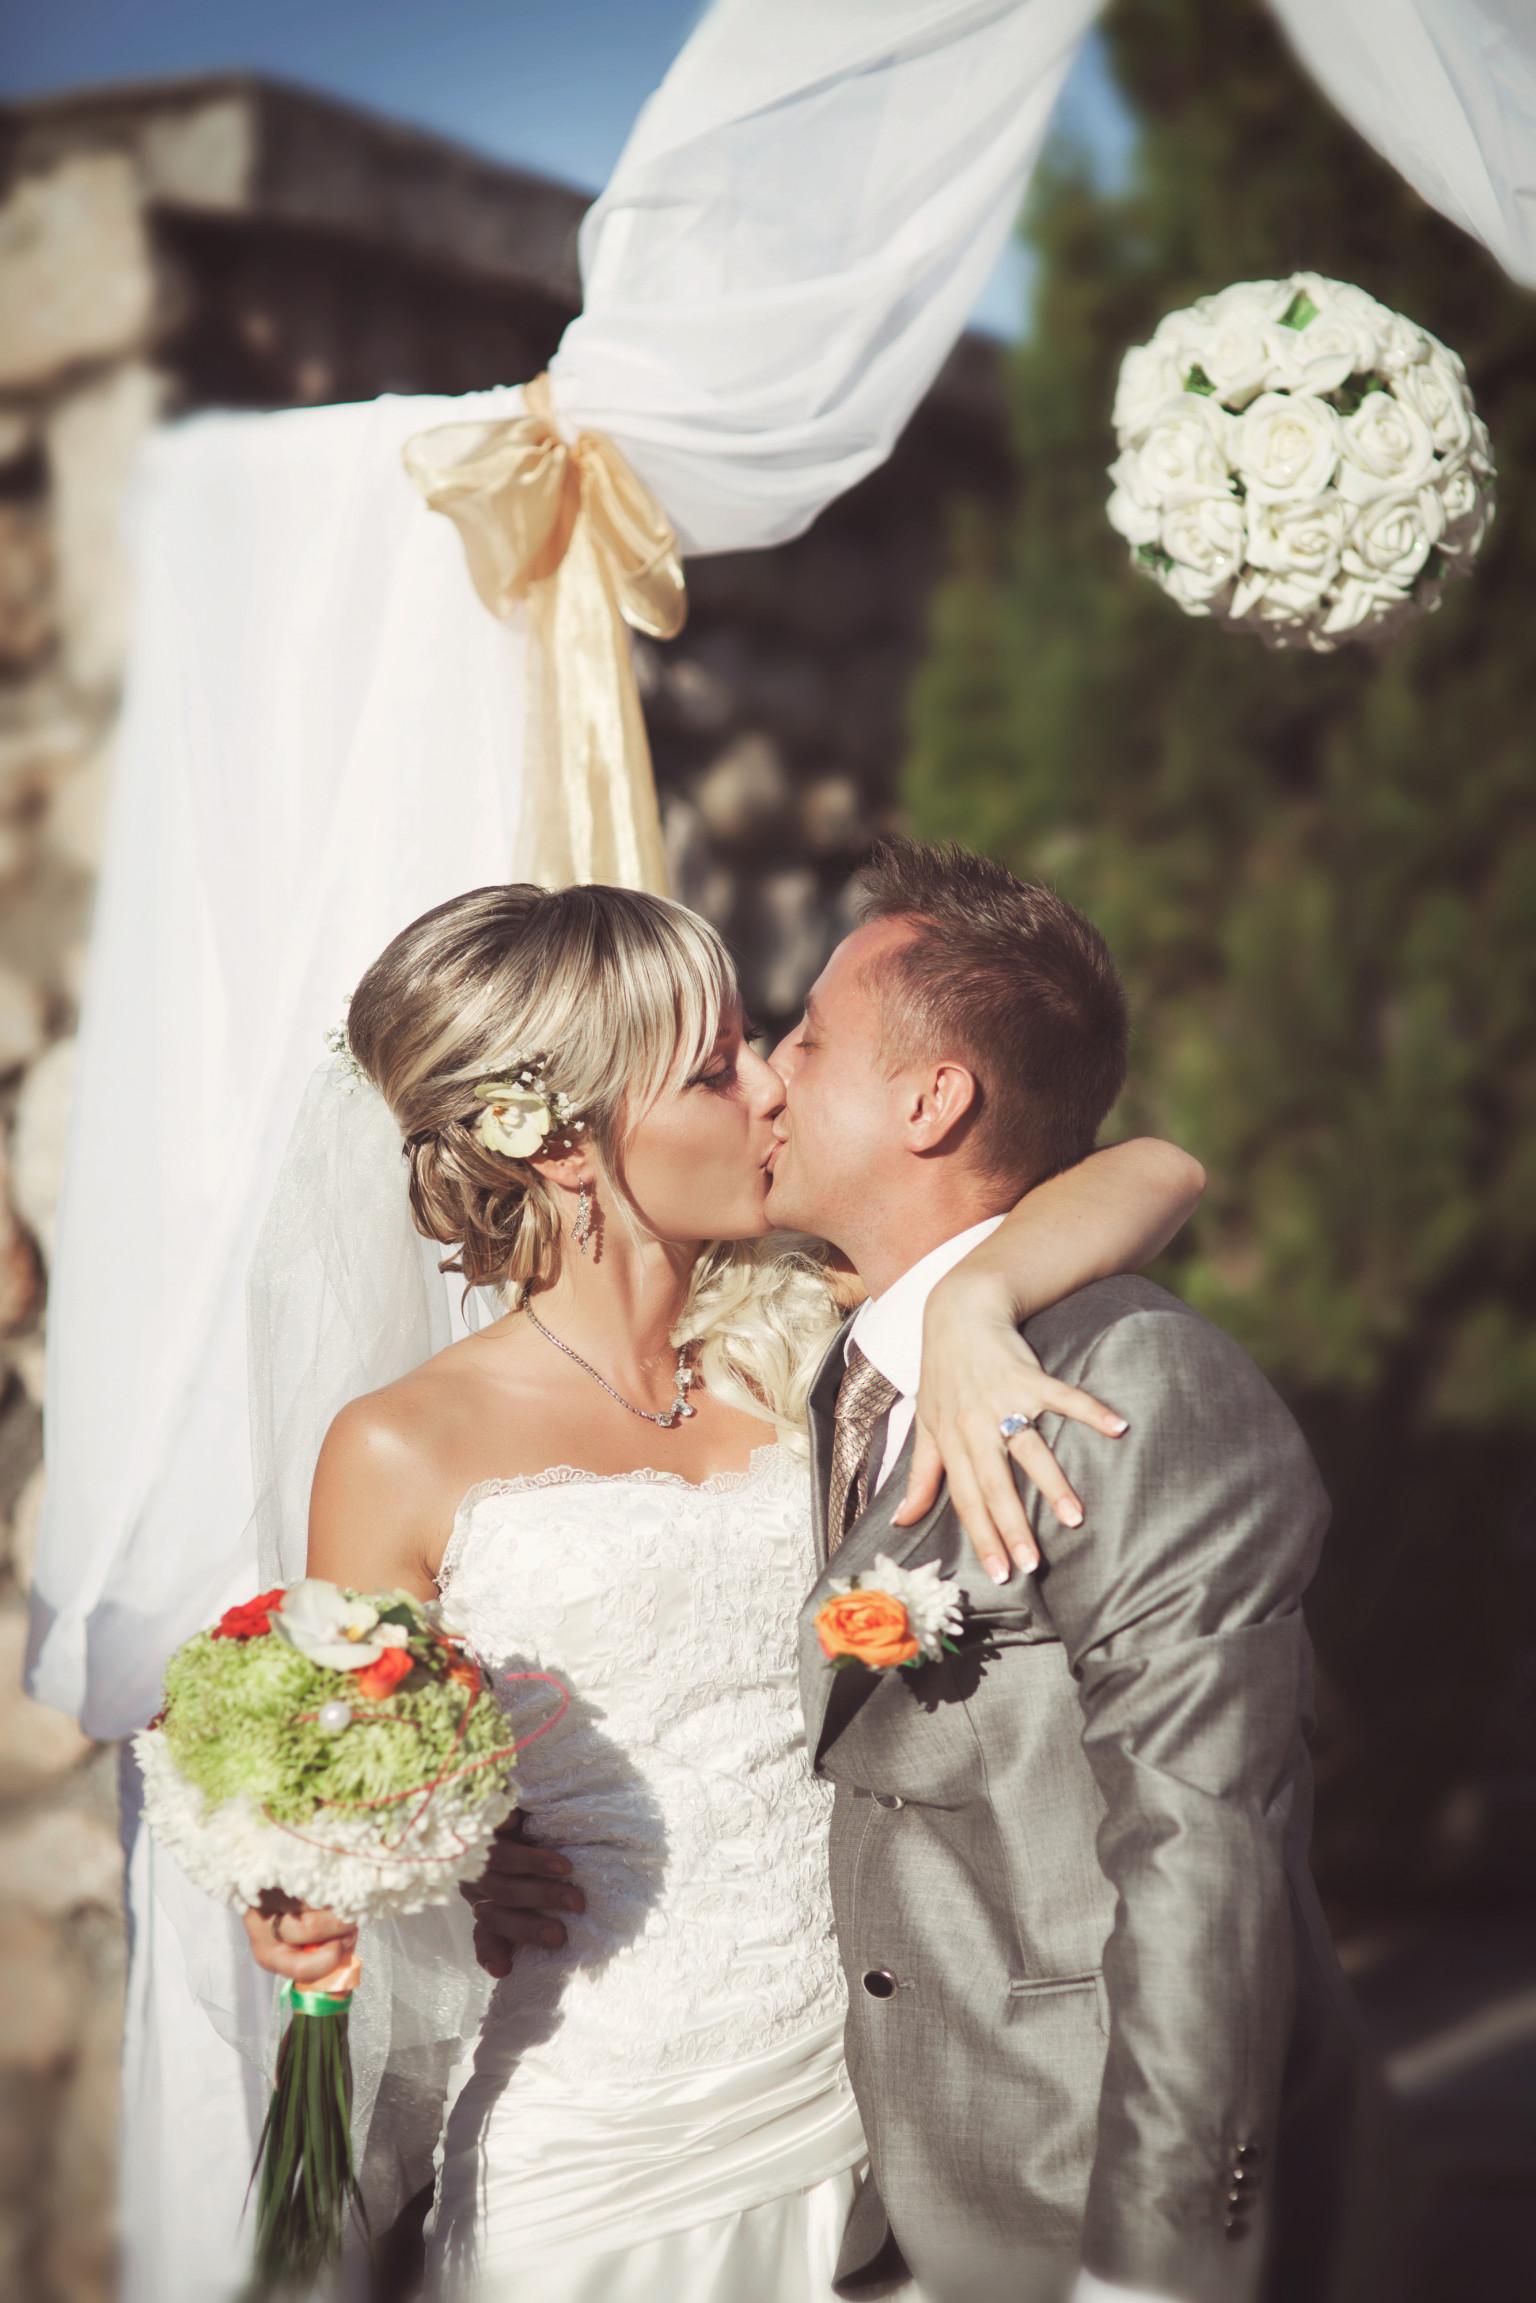 Best Celebrity Wedding Dresses - The Most Stunning ... - ELLE